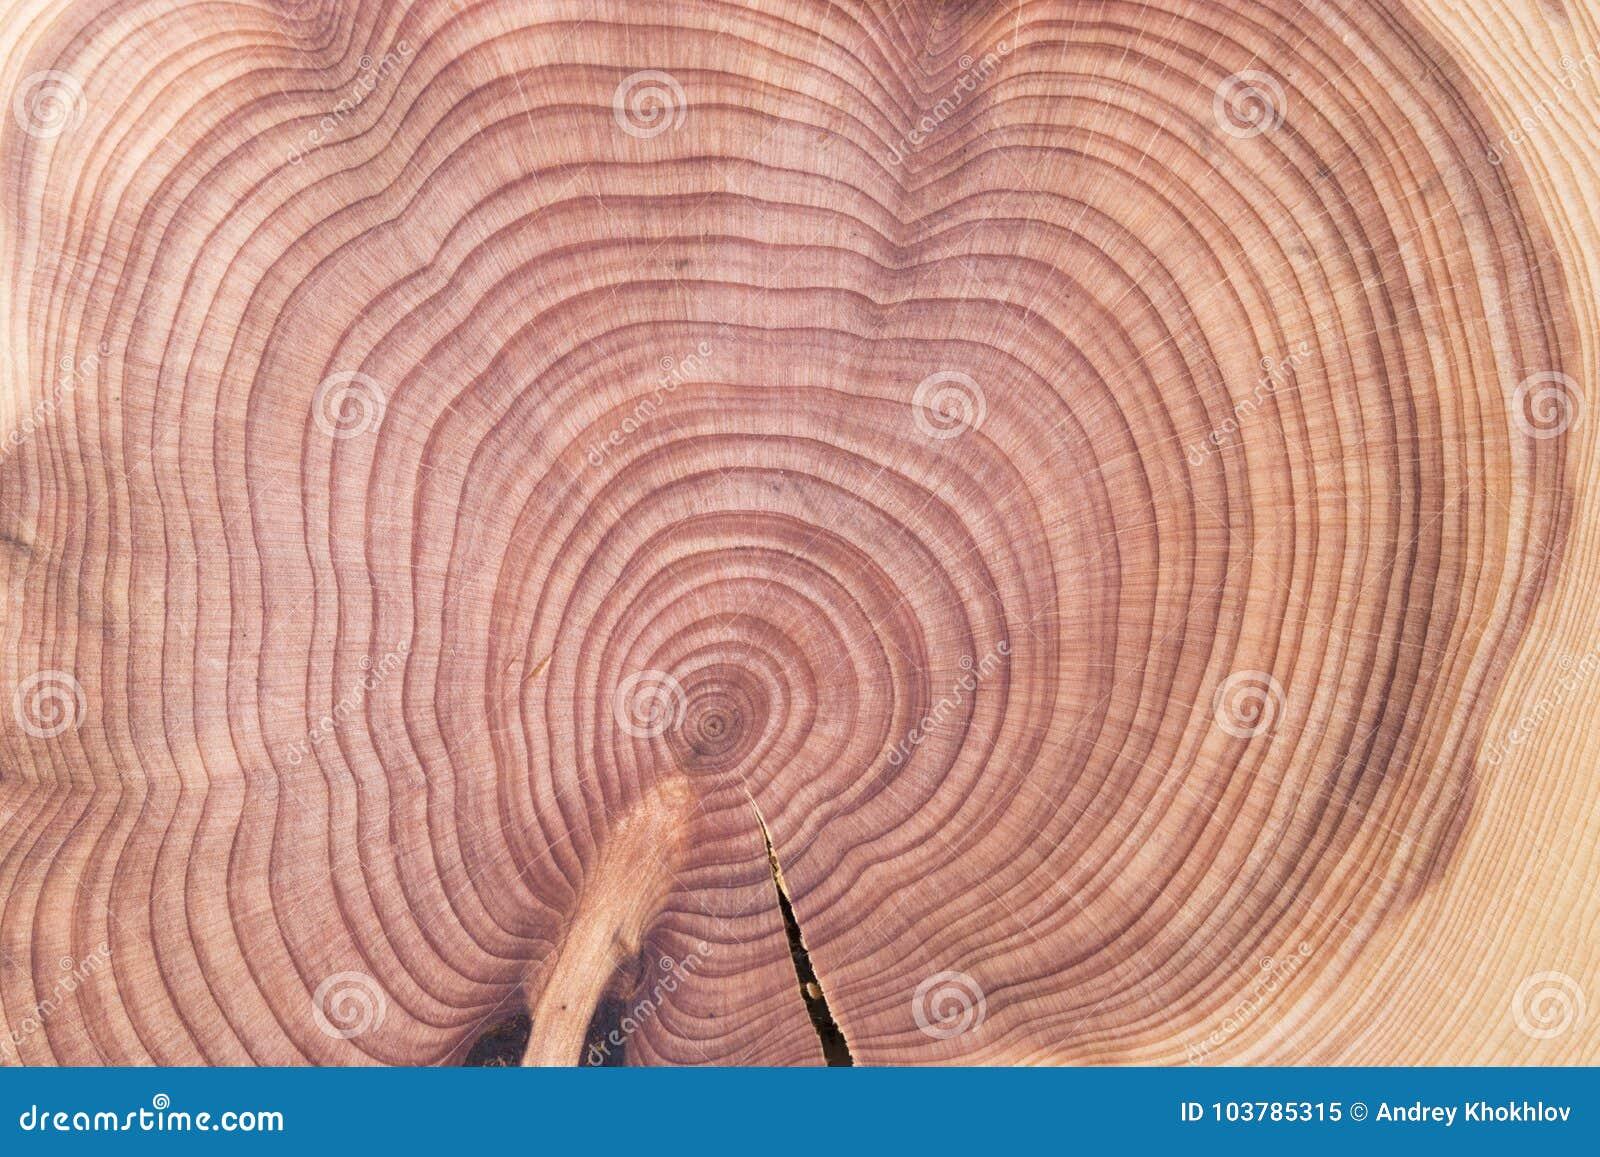 Wood Round Texture Cracked Juniper Stock Image Image Of Circle